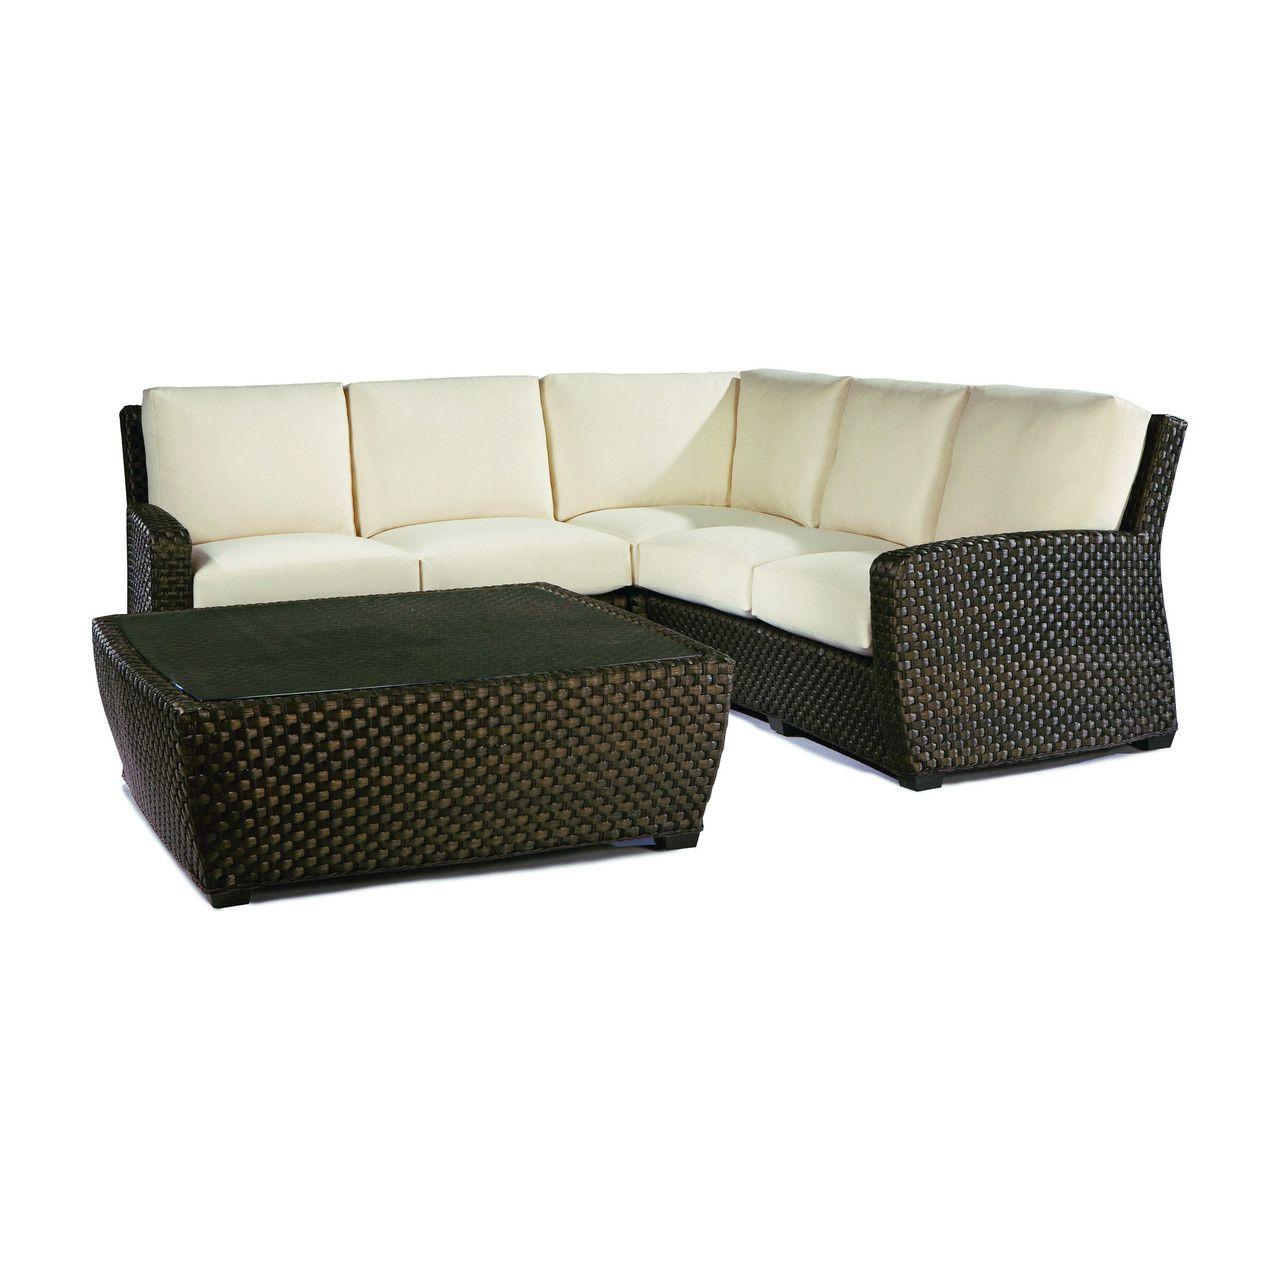 Leeward Sectional | Lane Venture Outdoor Furniture | Toms Price Furniture    Rugs   Design Part 48